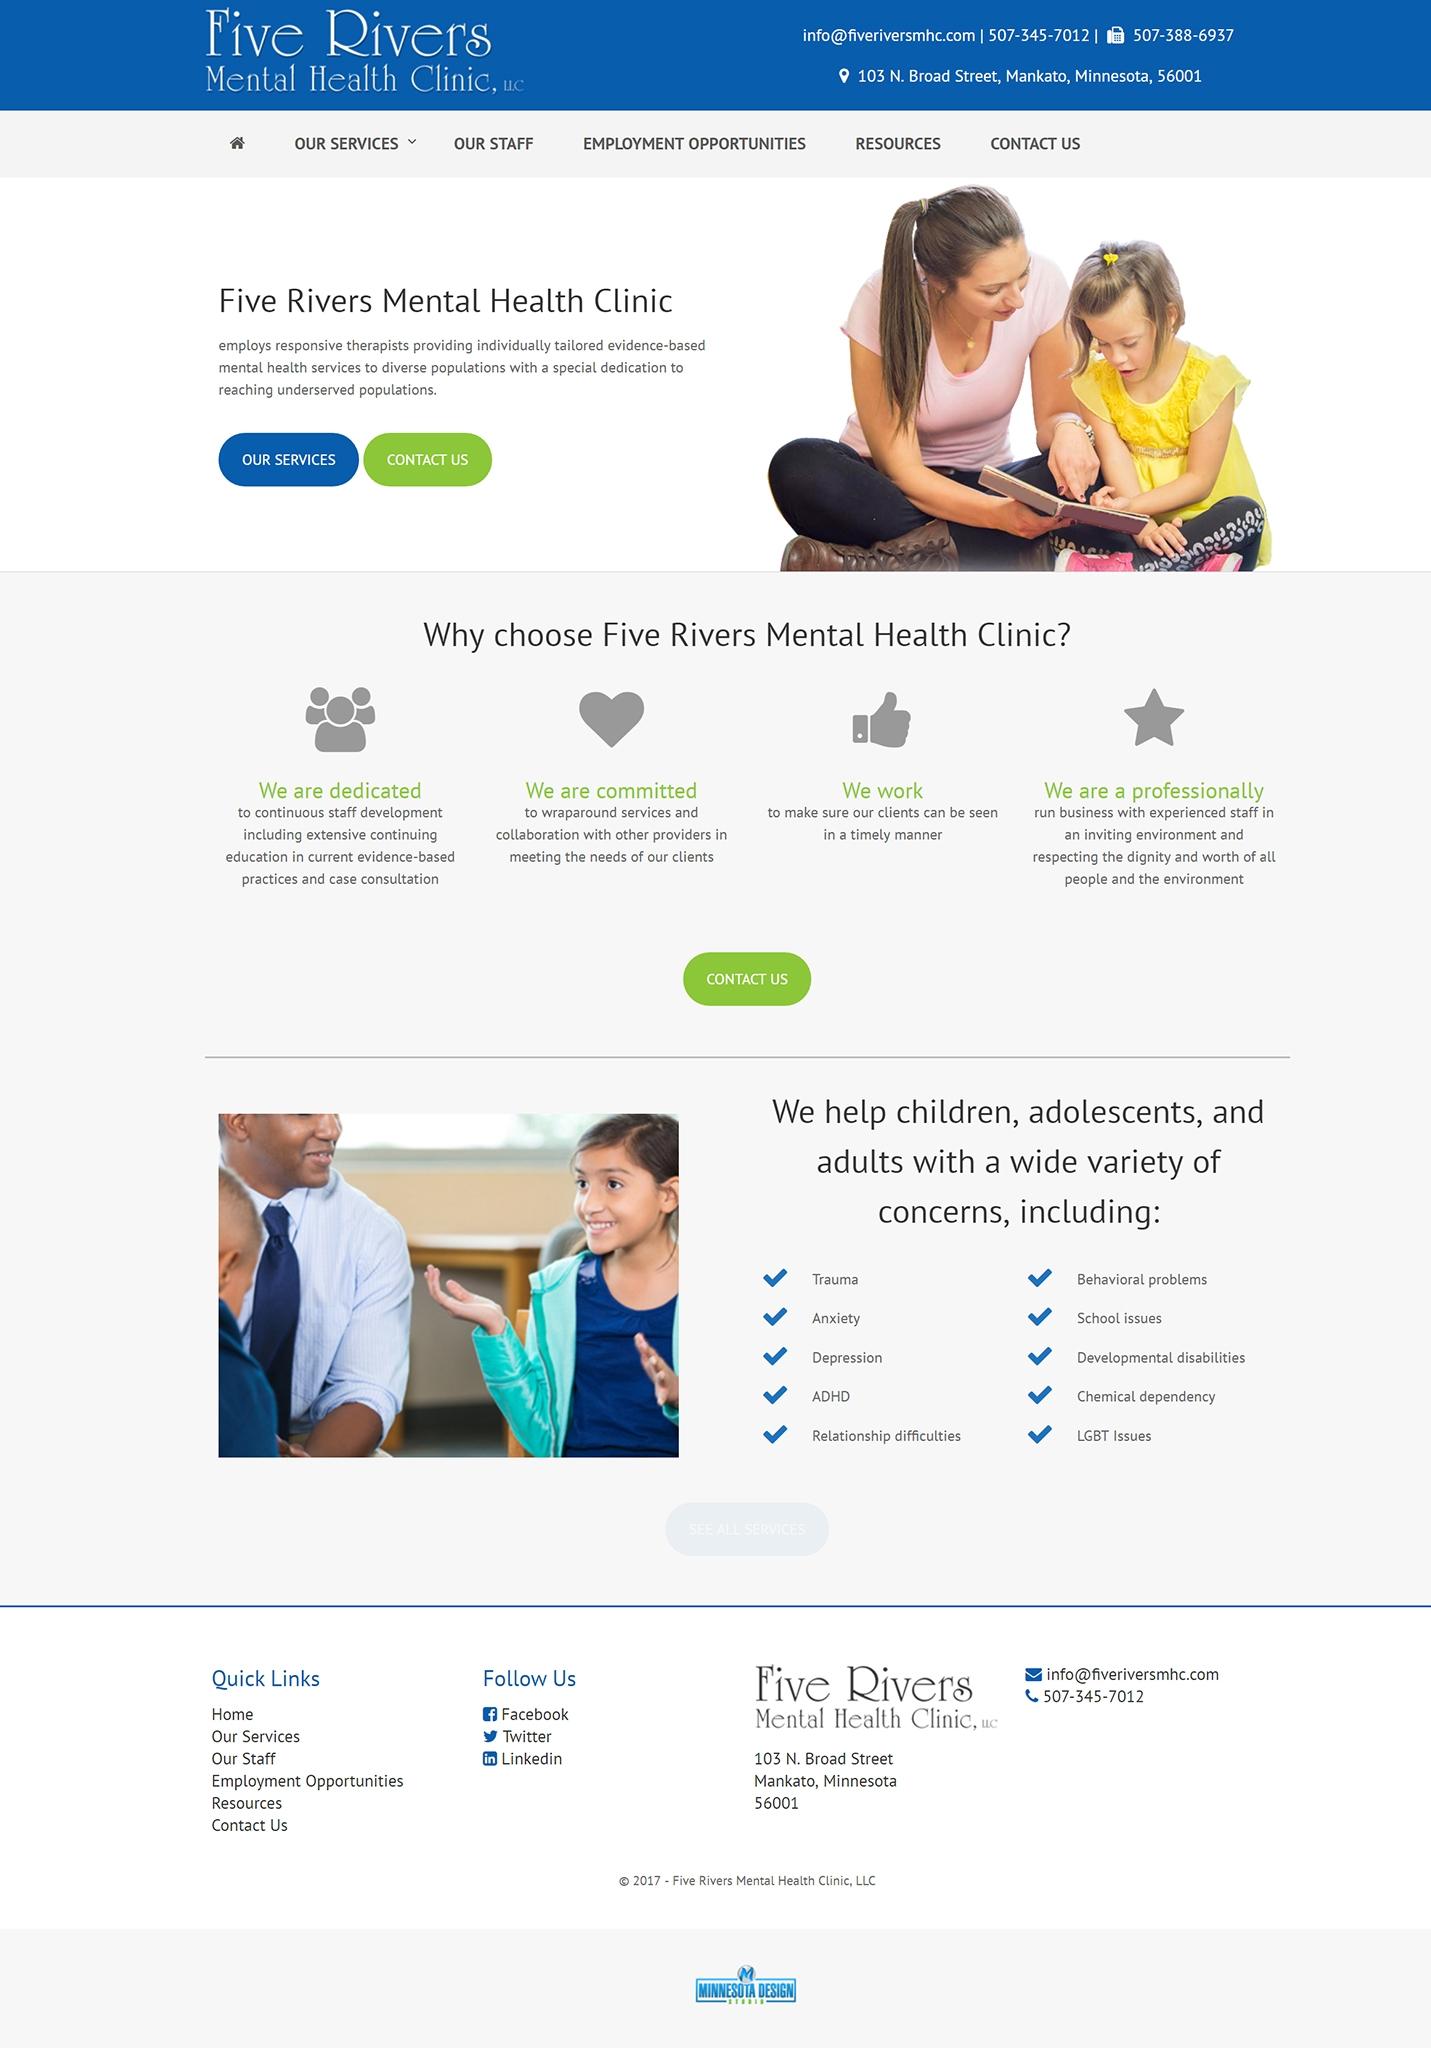 Five Rivers Mental Health Clinic Minnesota Design Studio